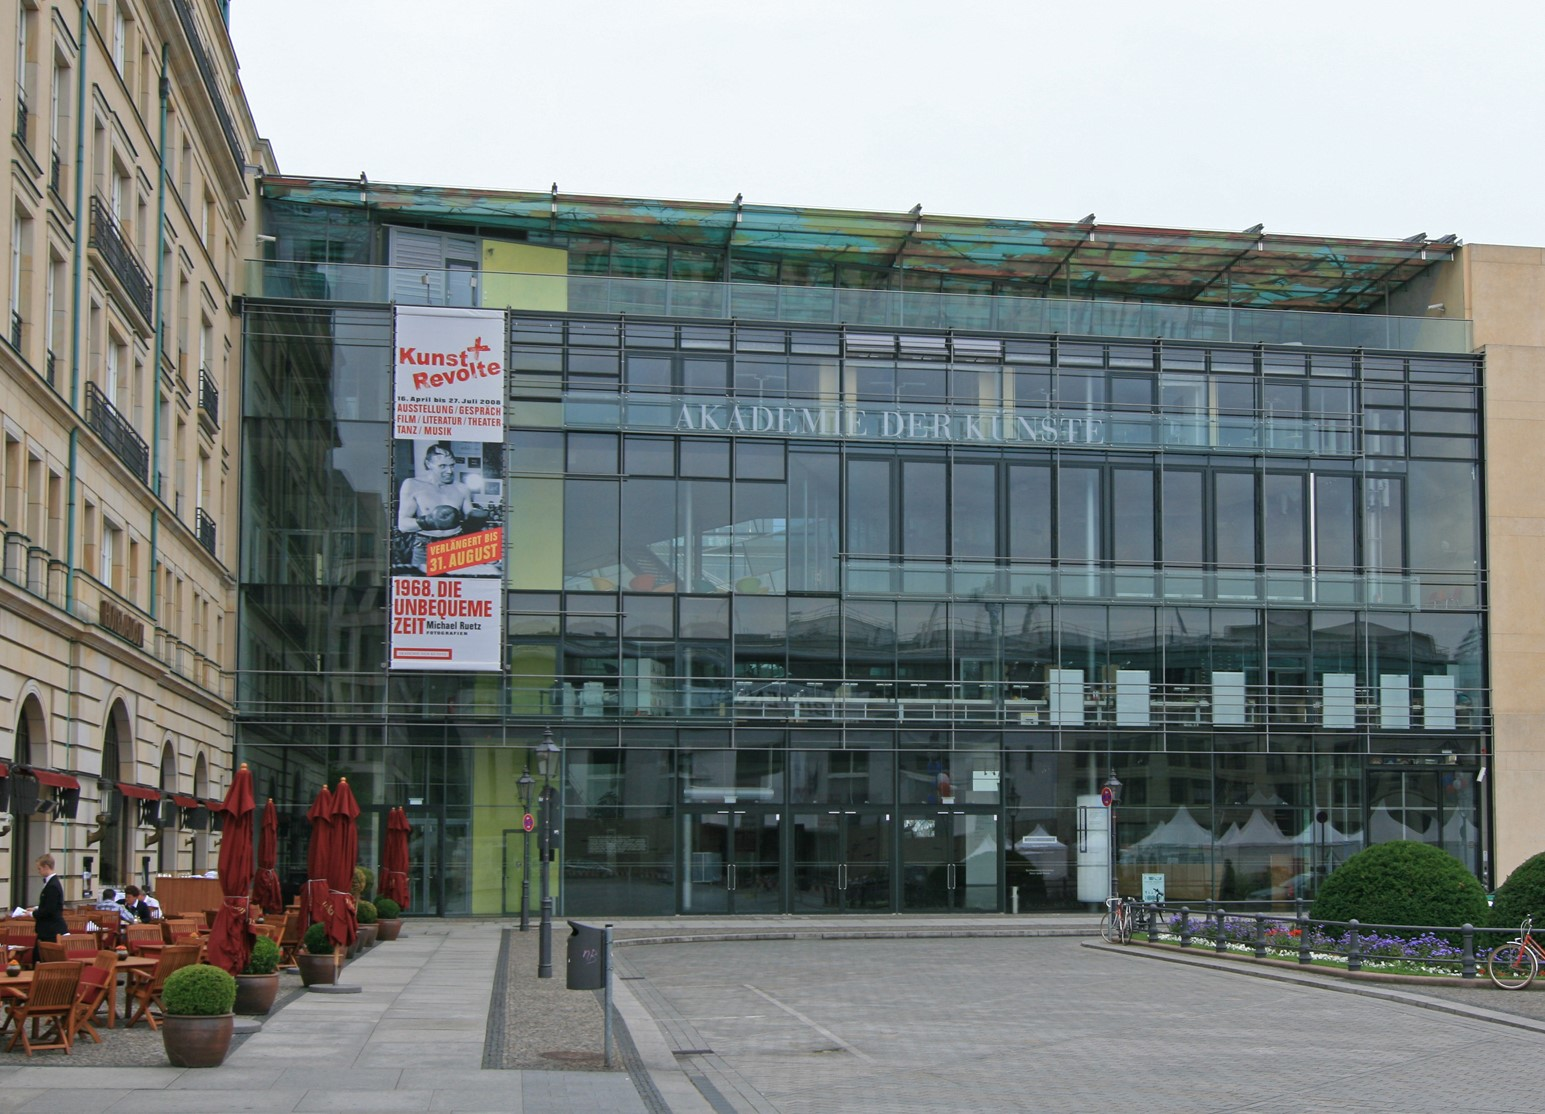 berlin-akademie-der-kunste